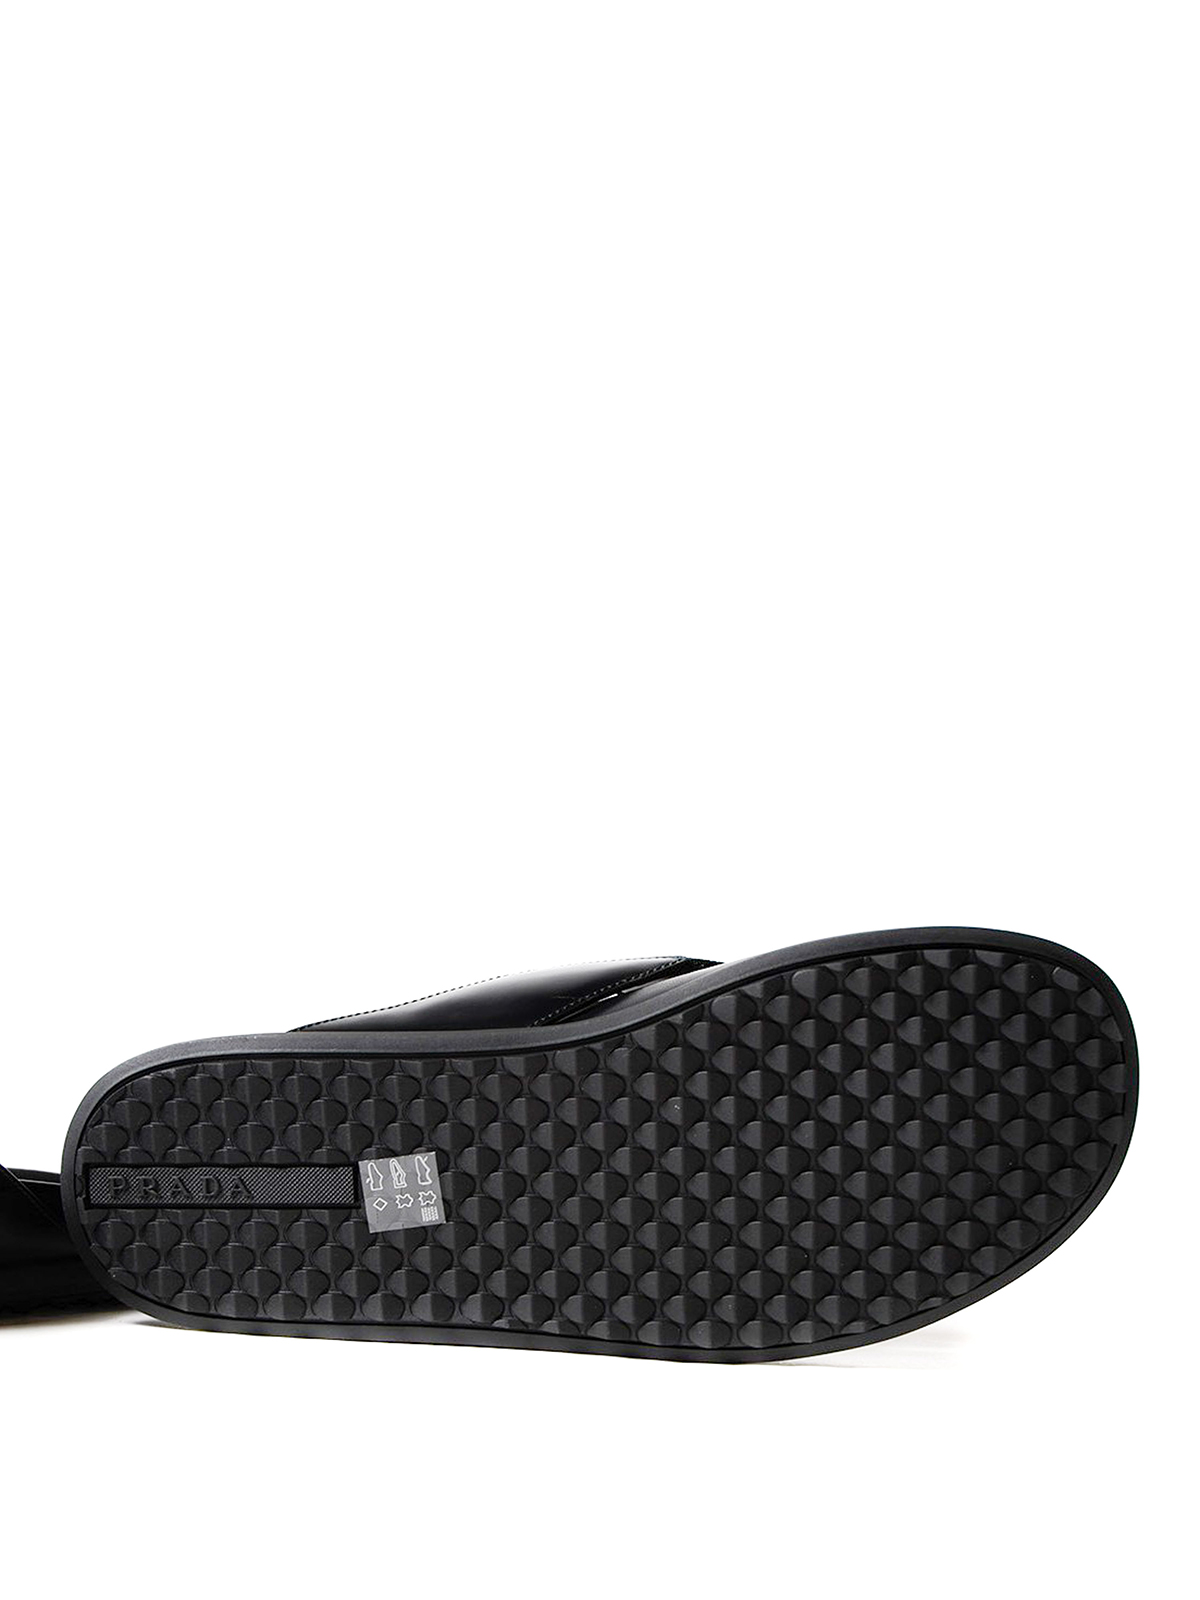 048284a84b0b Prada - Leather and fabric thong sandals - sandals - 4Y32081O2C002